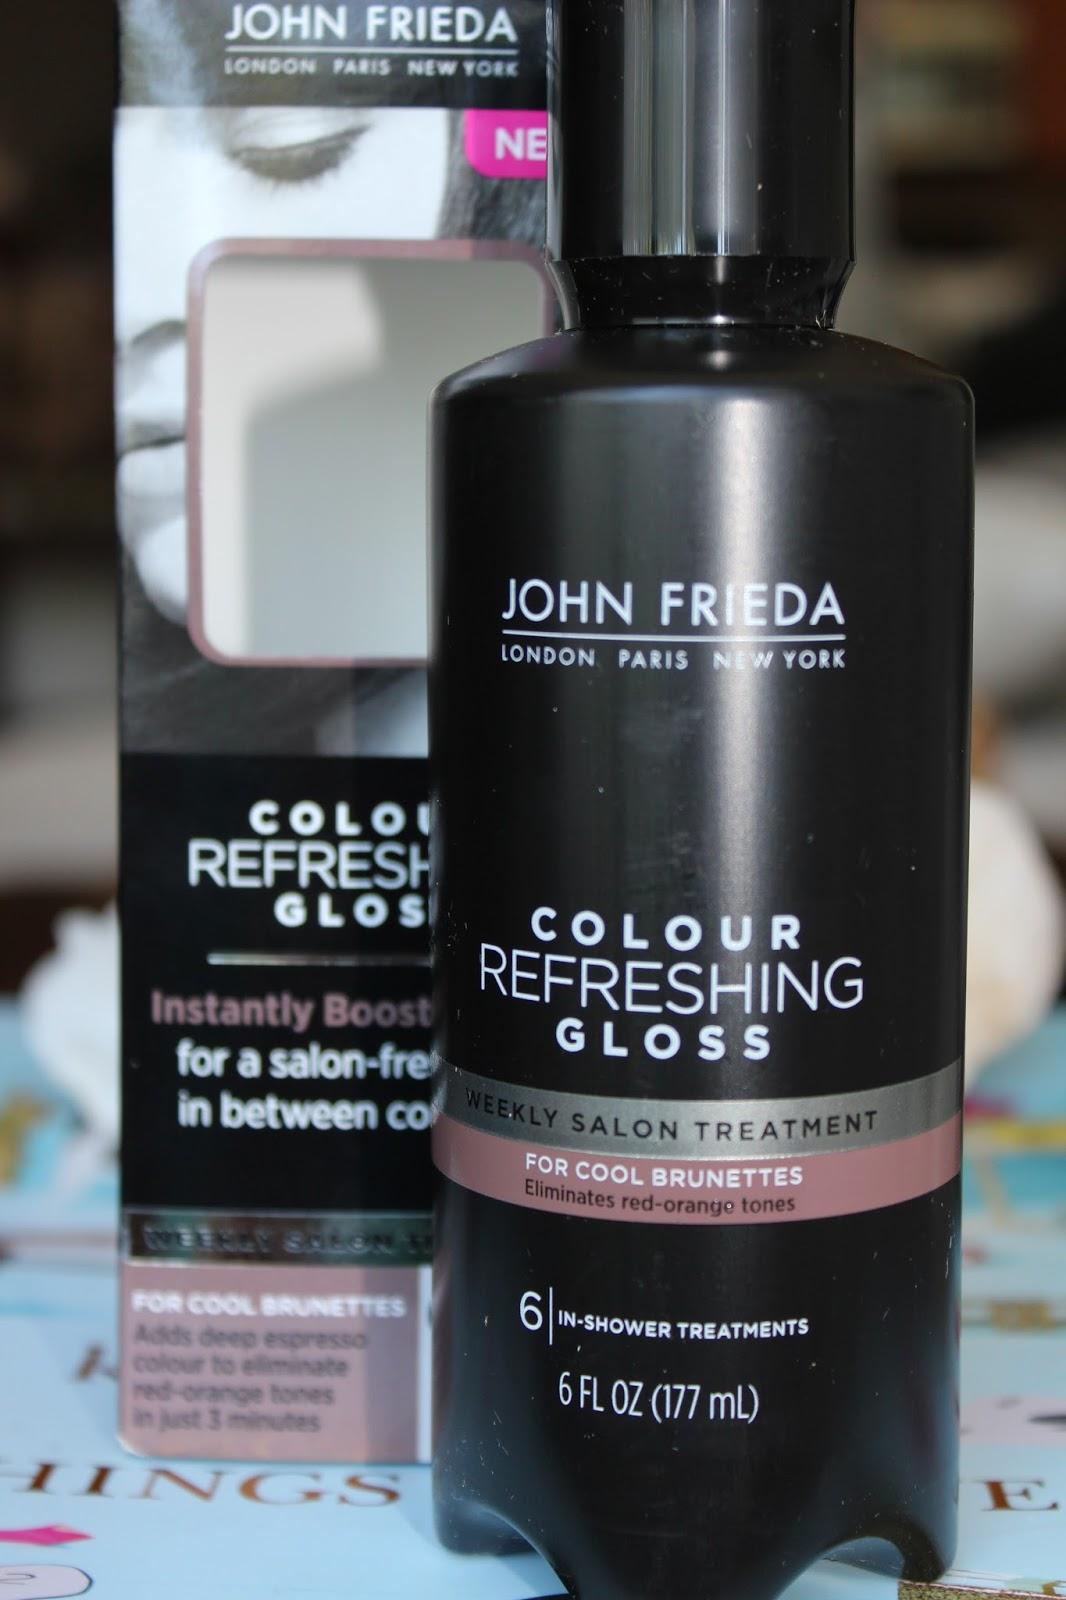 john frieda colour refreshing gloss - Color Refreshing Gloss